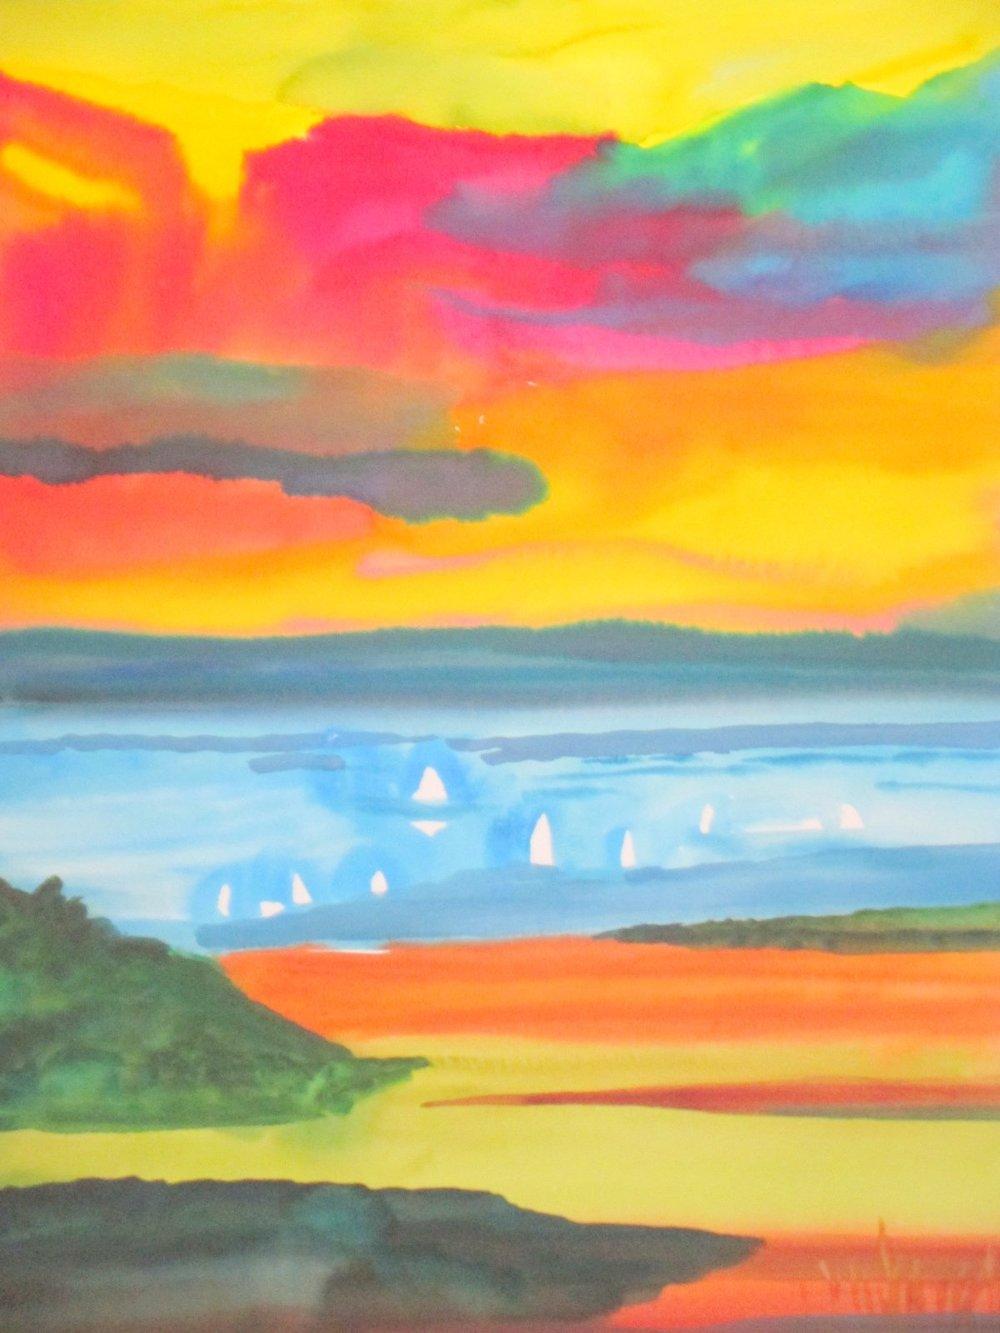 GalleryBlink4_sailboats.jpeg